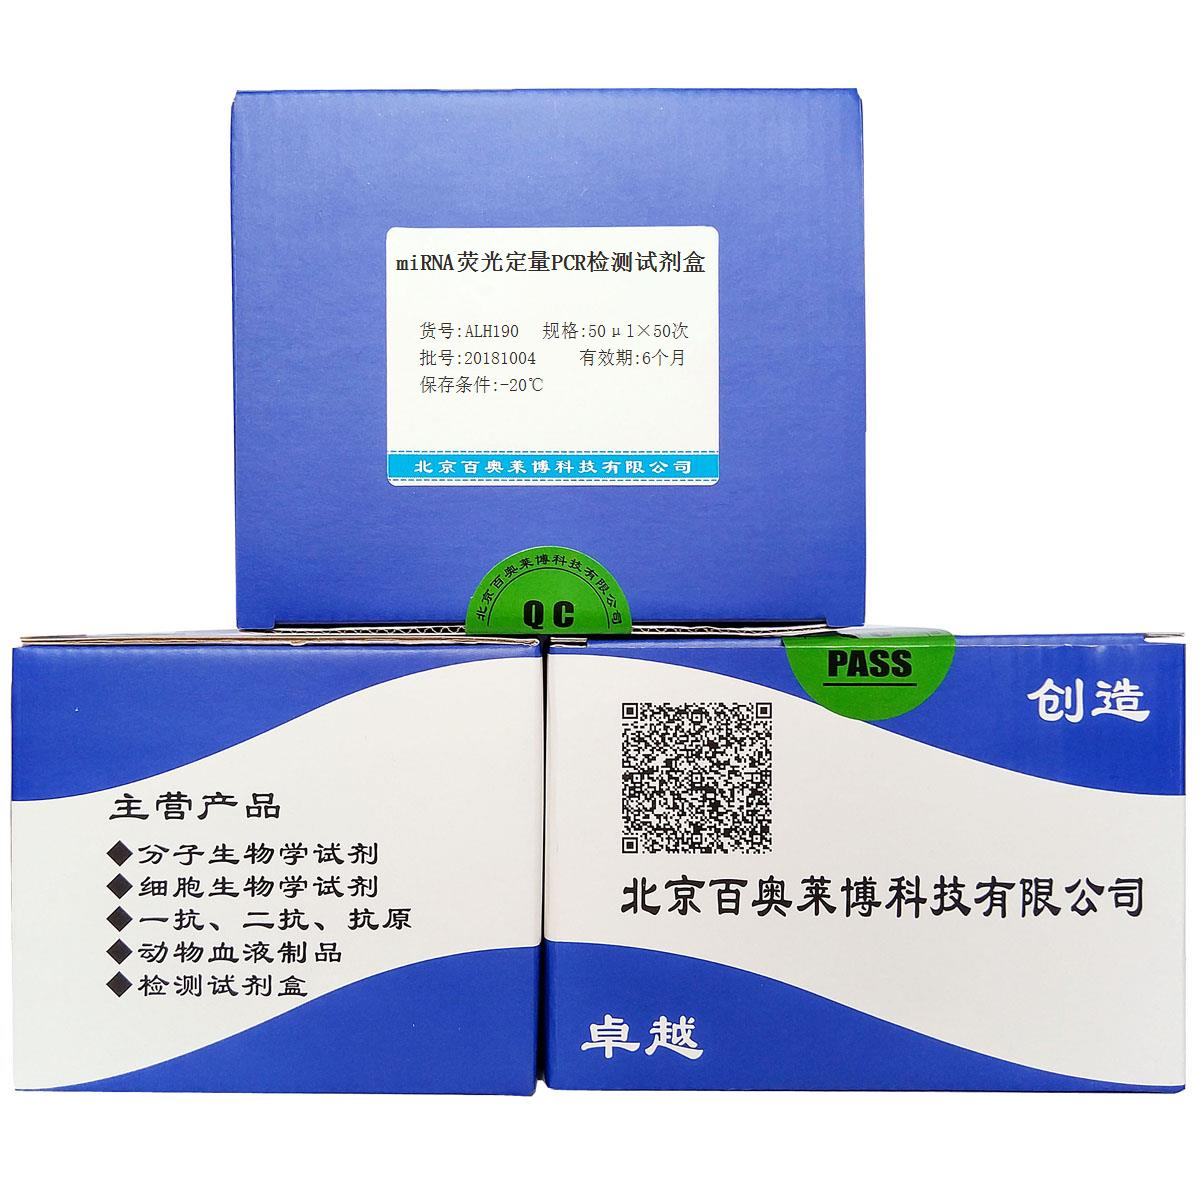 miRNA荧光定量PCR检测试剂盒